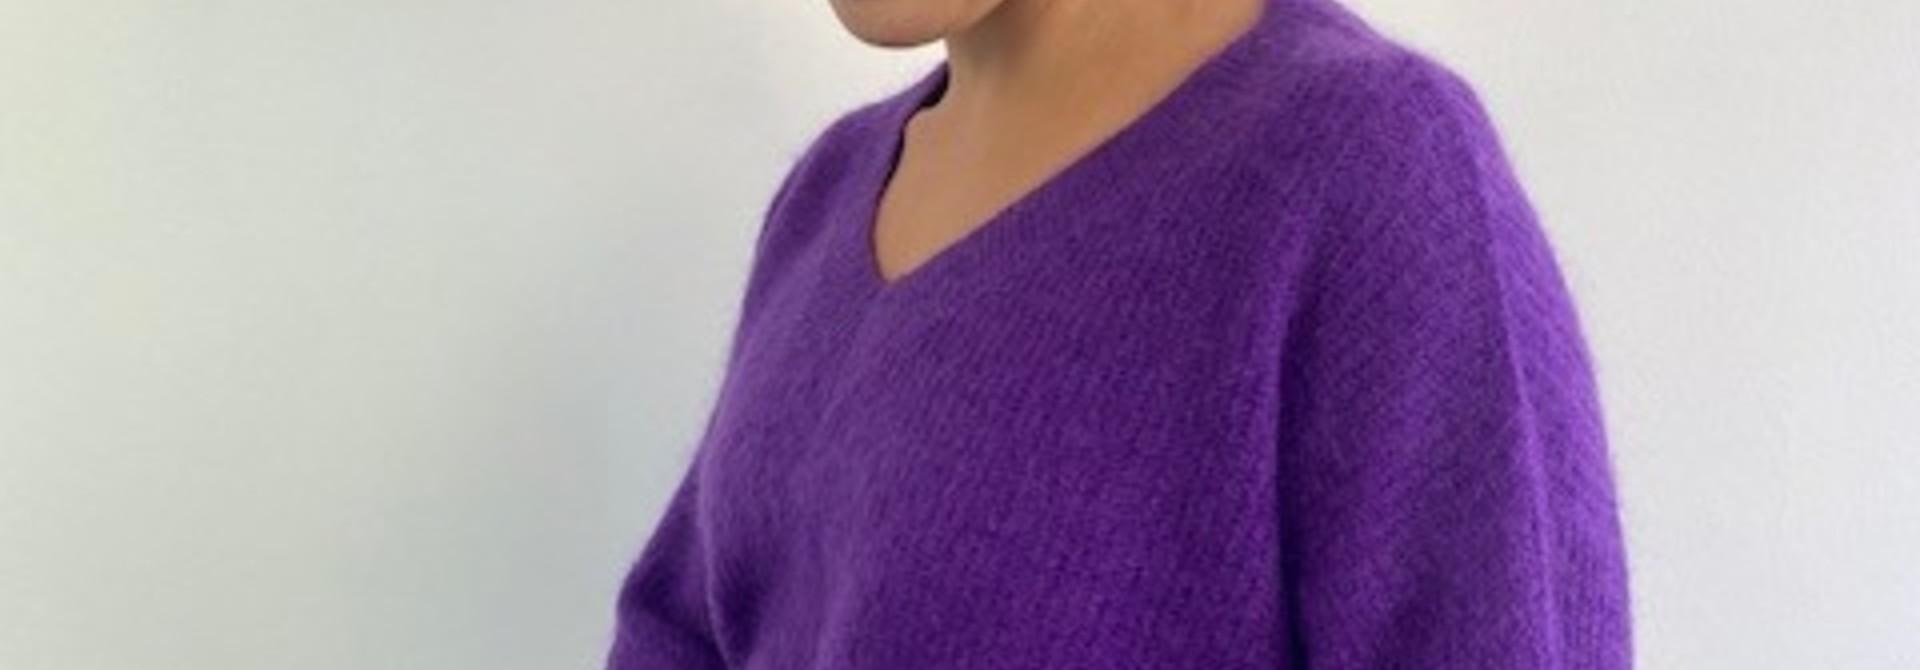 Louna v-neck knitted pull Bright Purple